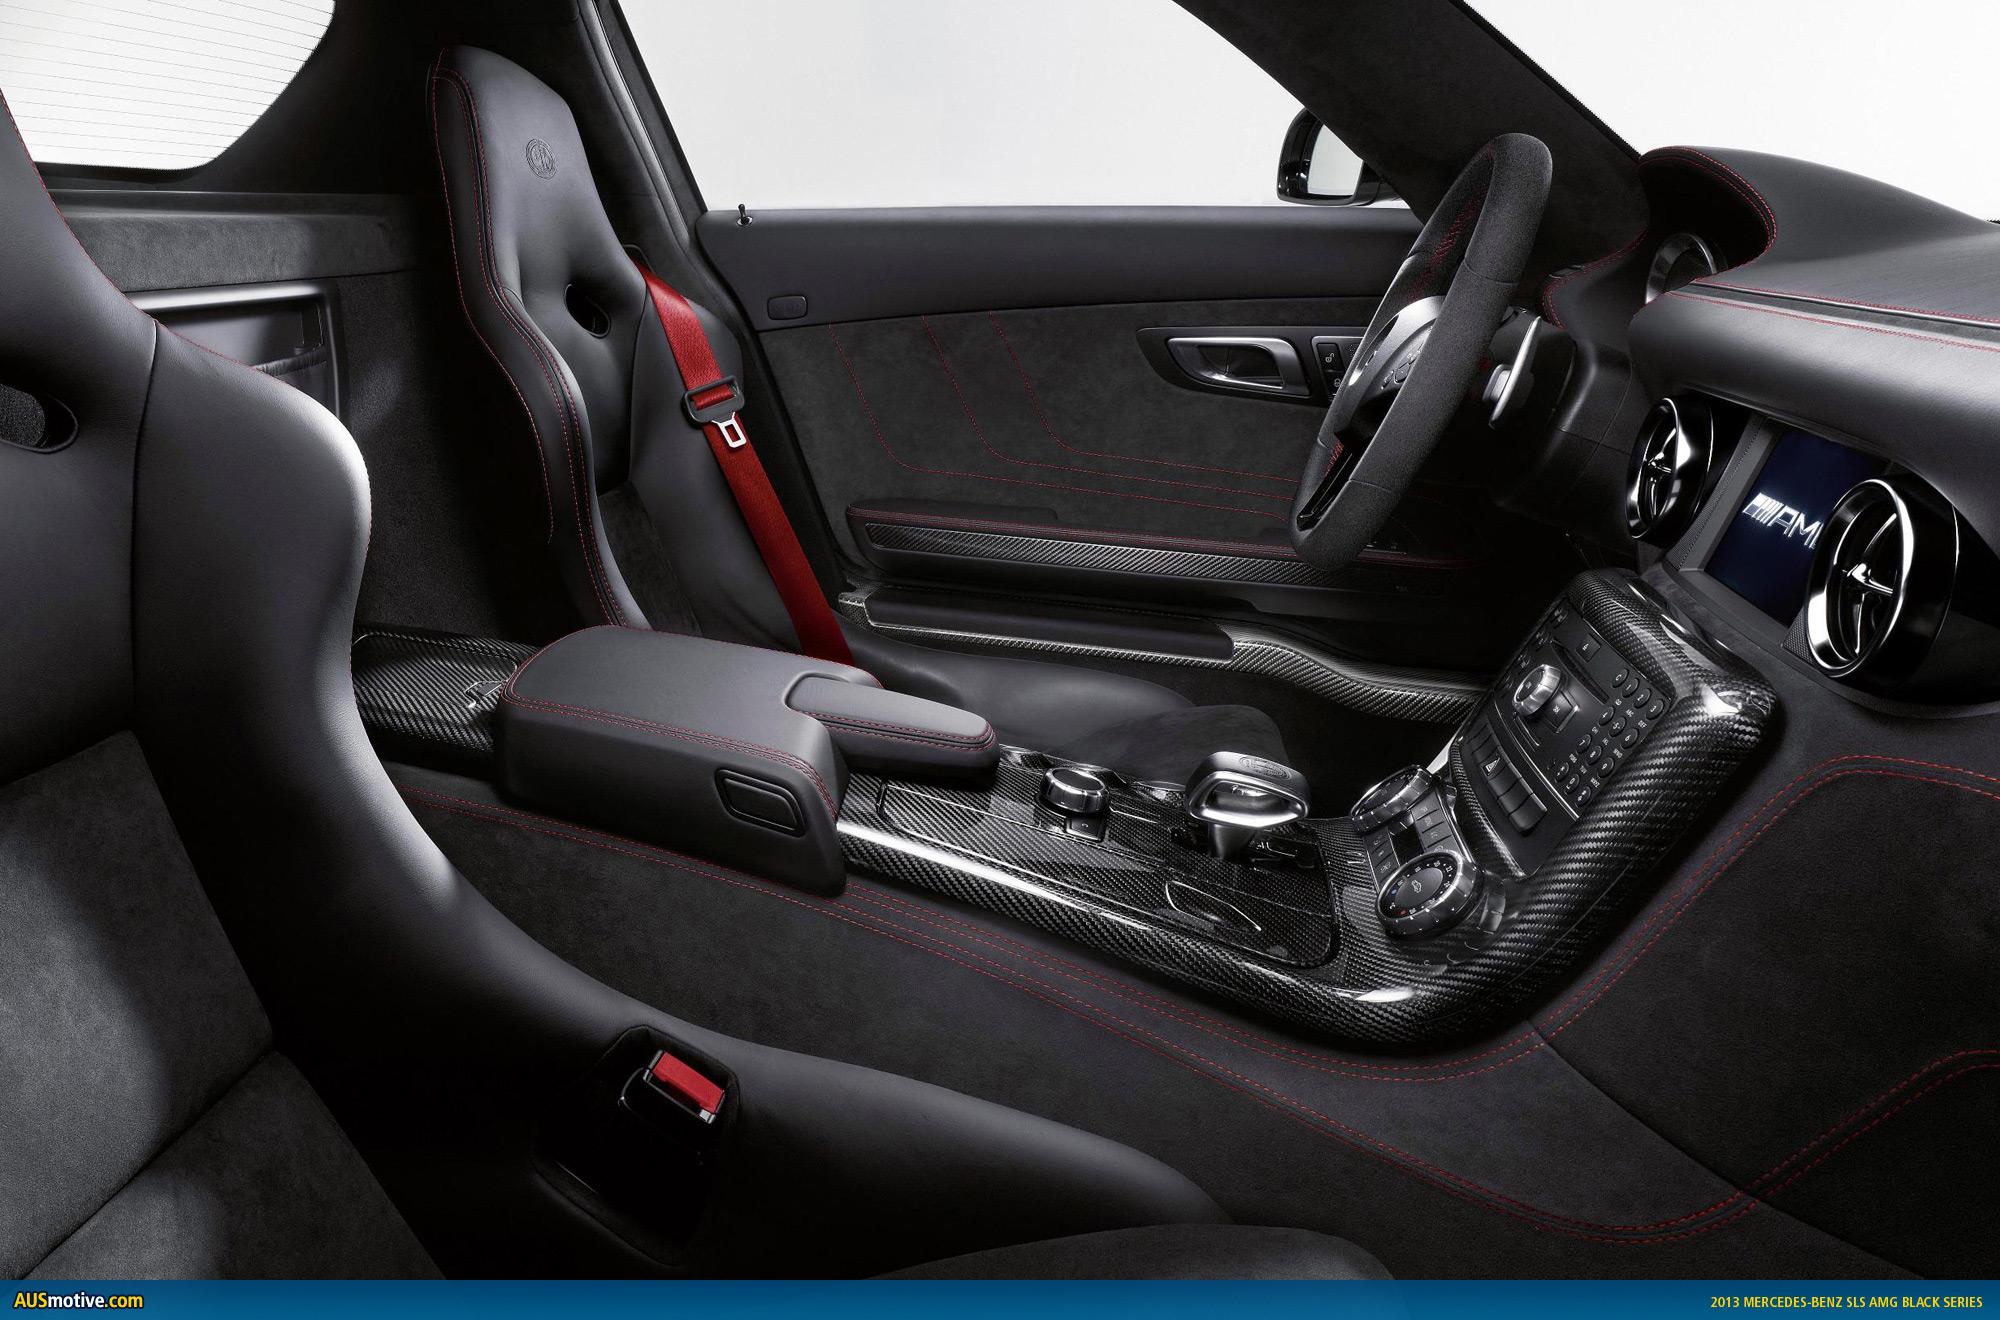 http://www.ausmotive.com/pics/2012/MB-SLS-AMG-Black-Series-20.jpg